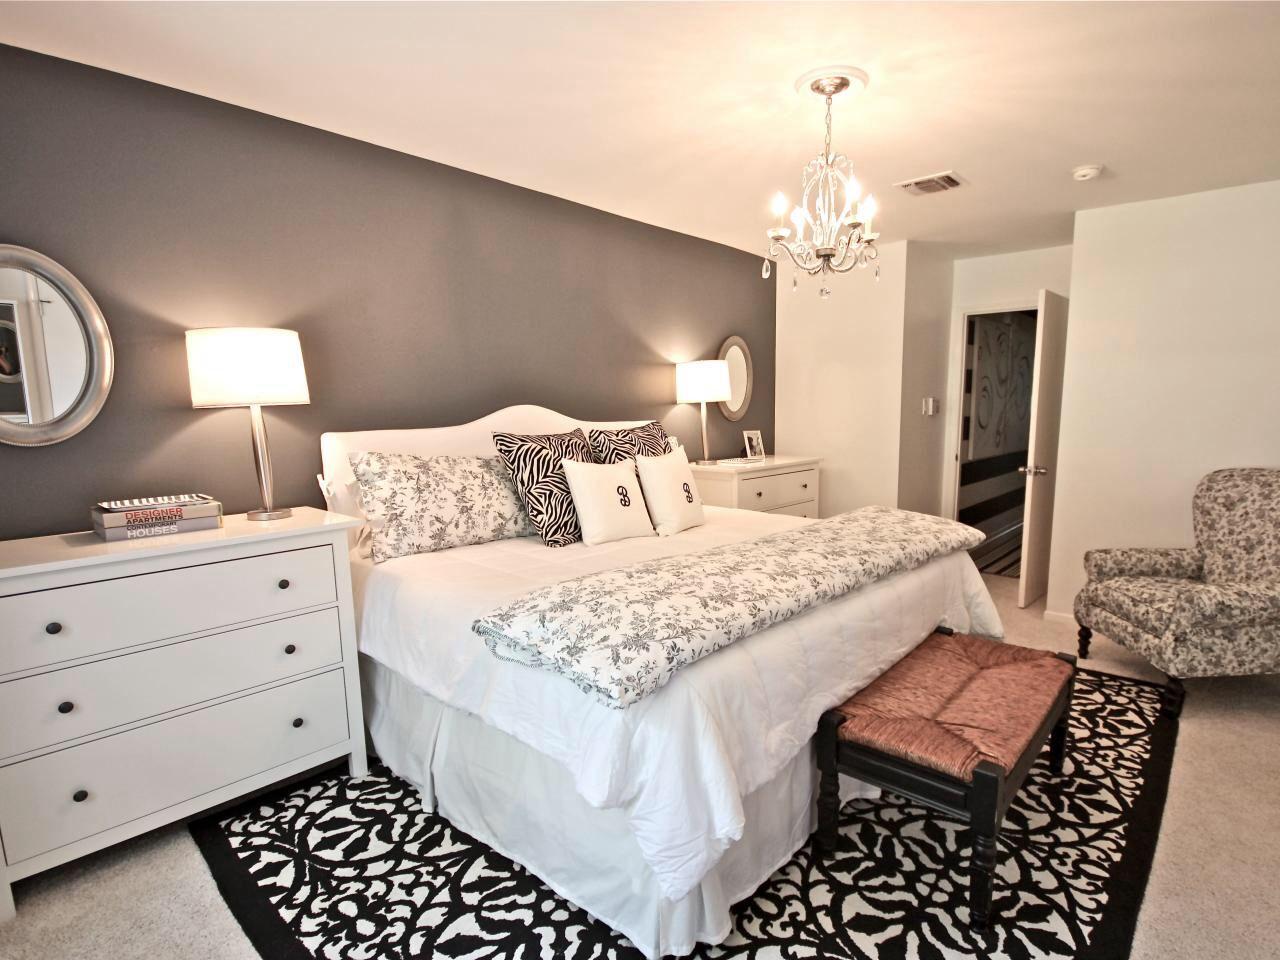 Image from http://hgtvhome.sndimg.com/content/dam/images/hgtv/fullset/2012/4/27/0/RMS_BeachBrights-romantic-gray-white-master-bedroom_s4x3.jpg.rend.hgtvcom.1280.960.jpeg.